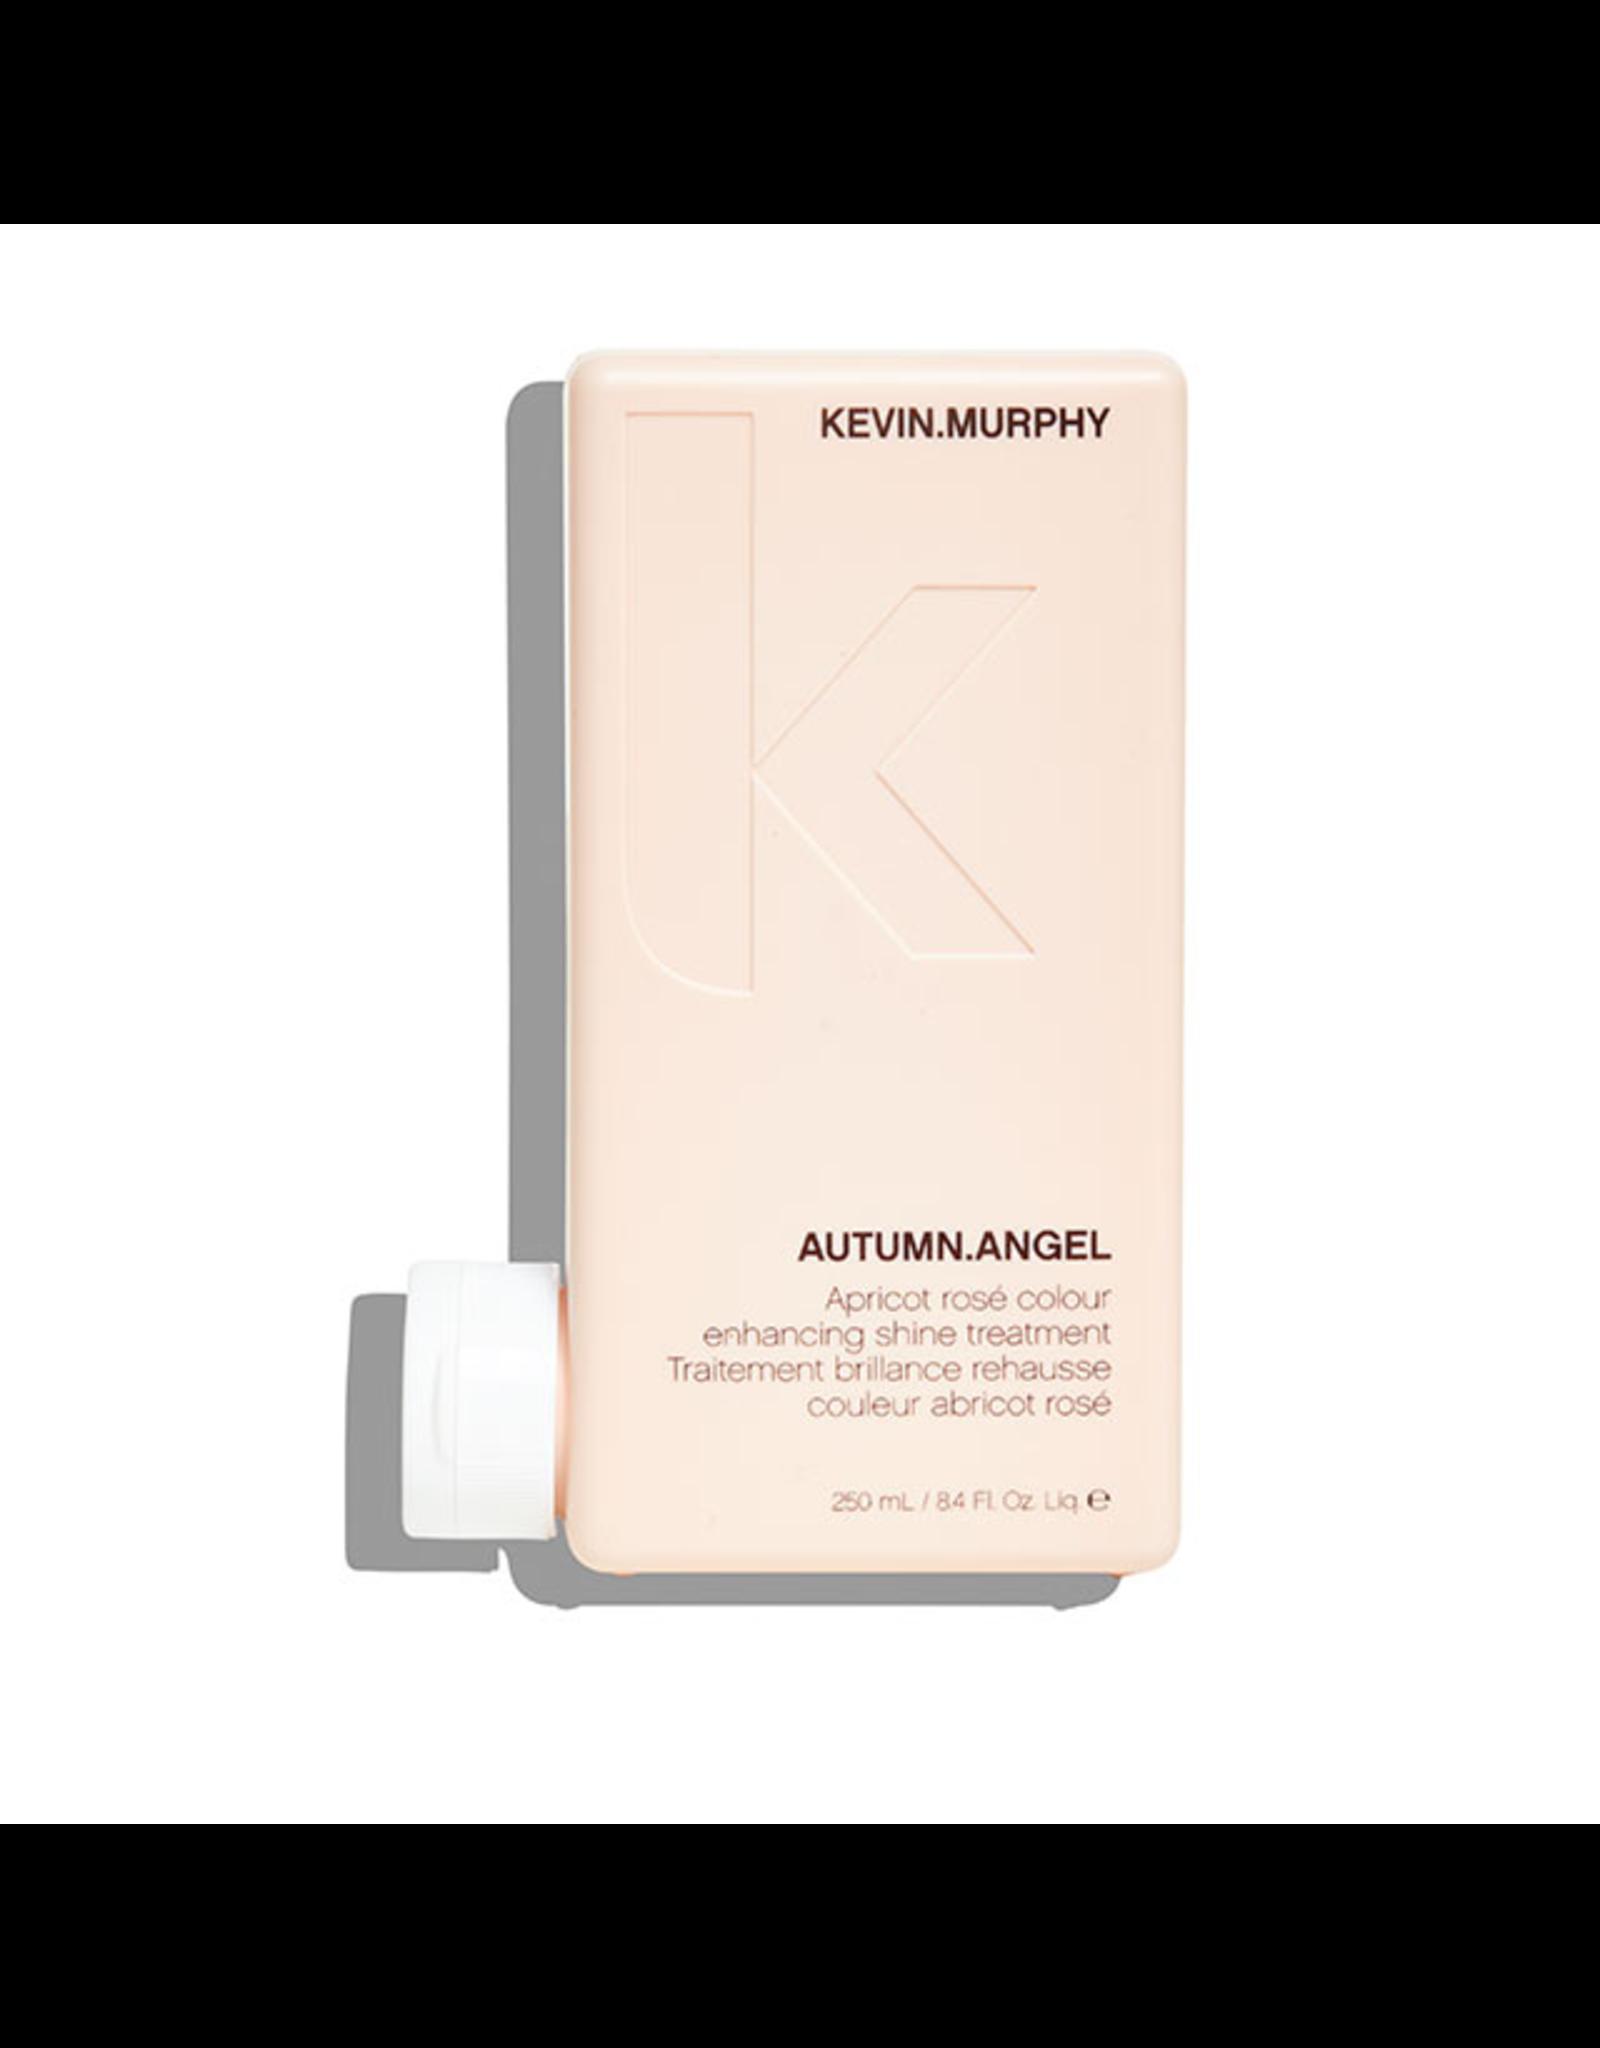 KEVIN.MURPHY Autumn.Angel Treatment (250 ml)